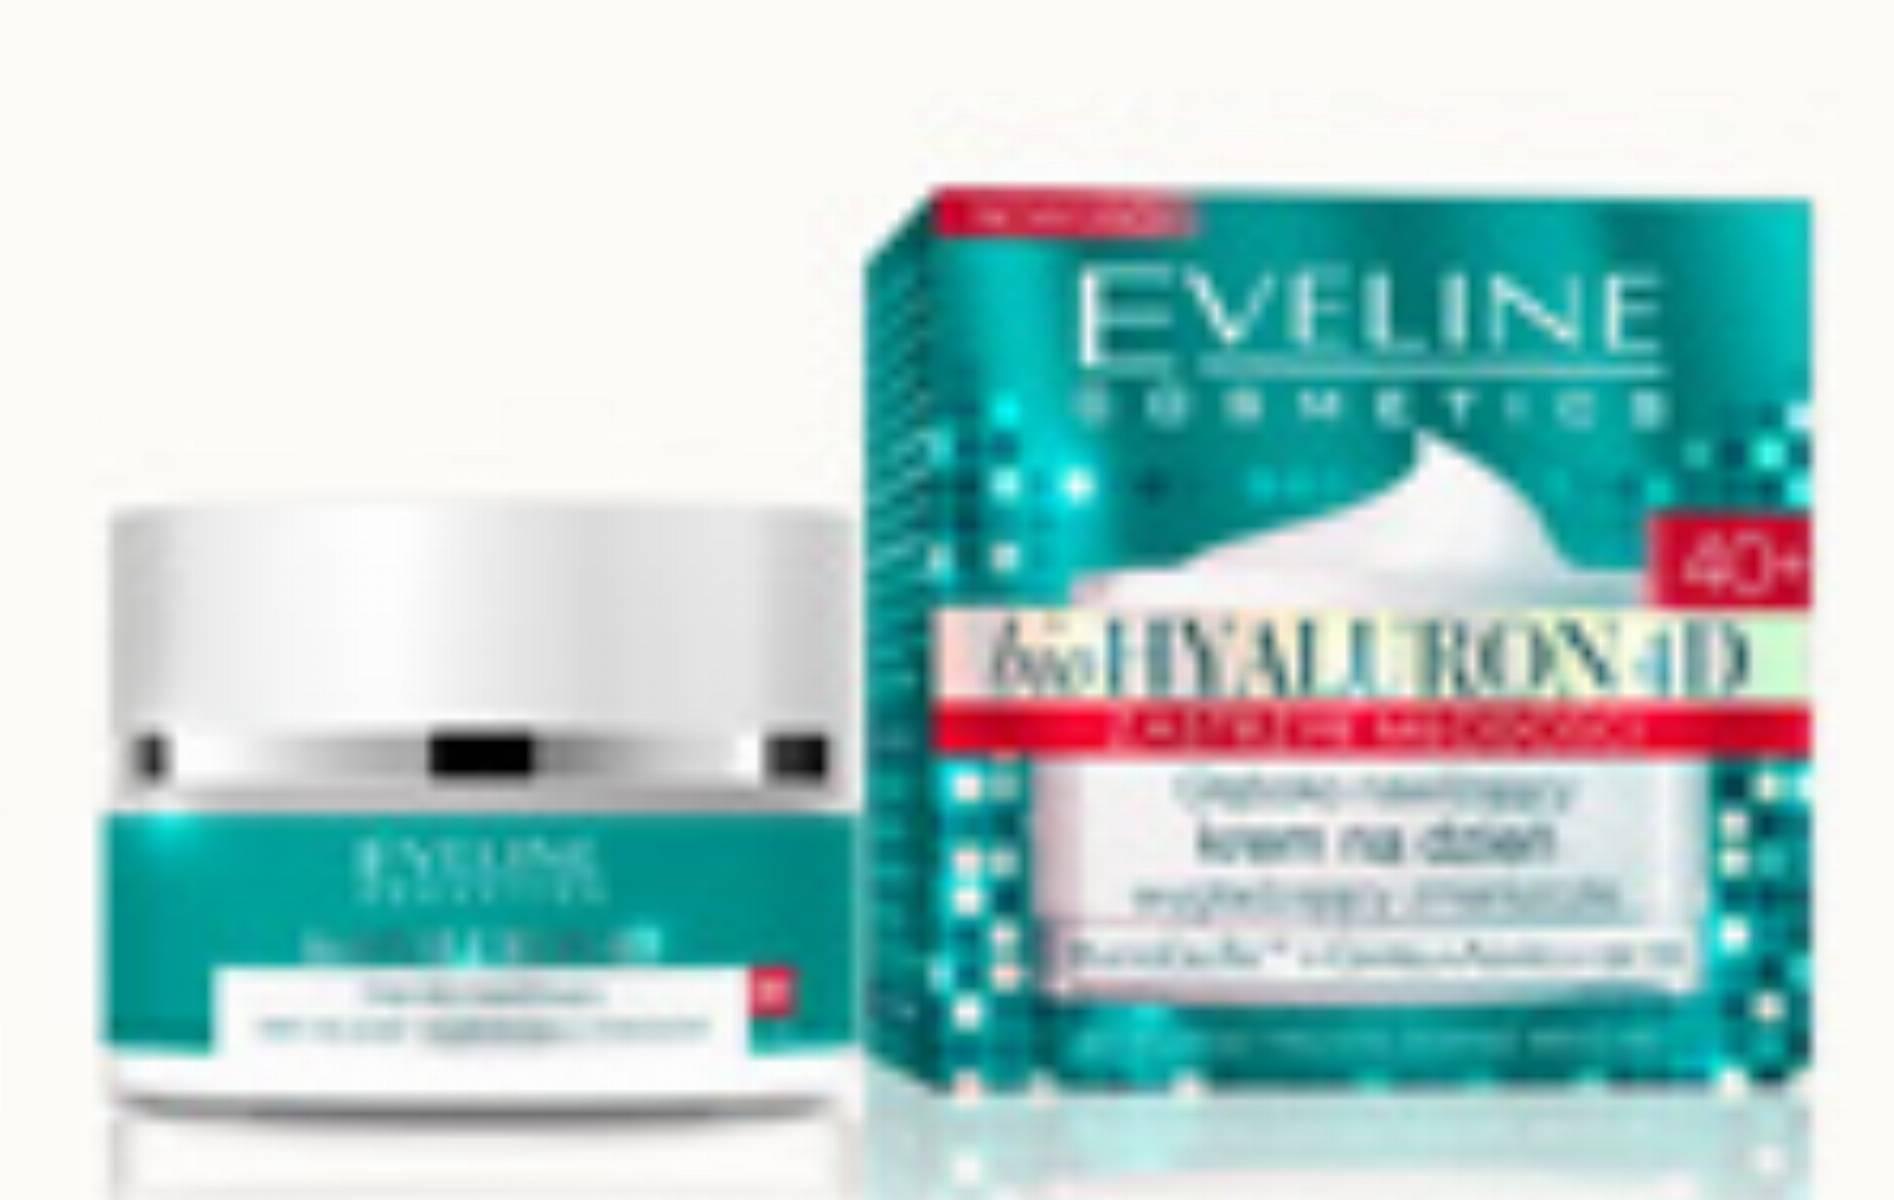 Eveline-Cosmetics-bioHYALURON-4D-Zastrzyk-Mlodosci-krem-na-dzien-40-plus_min